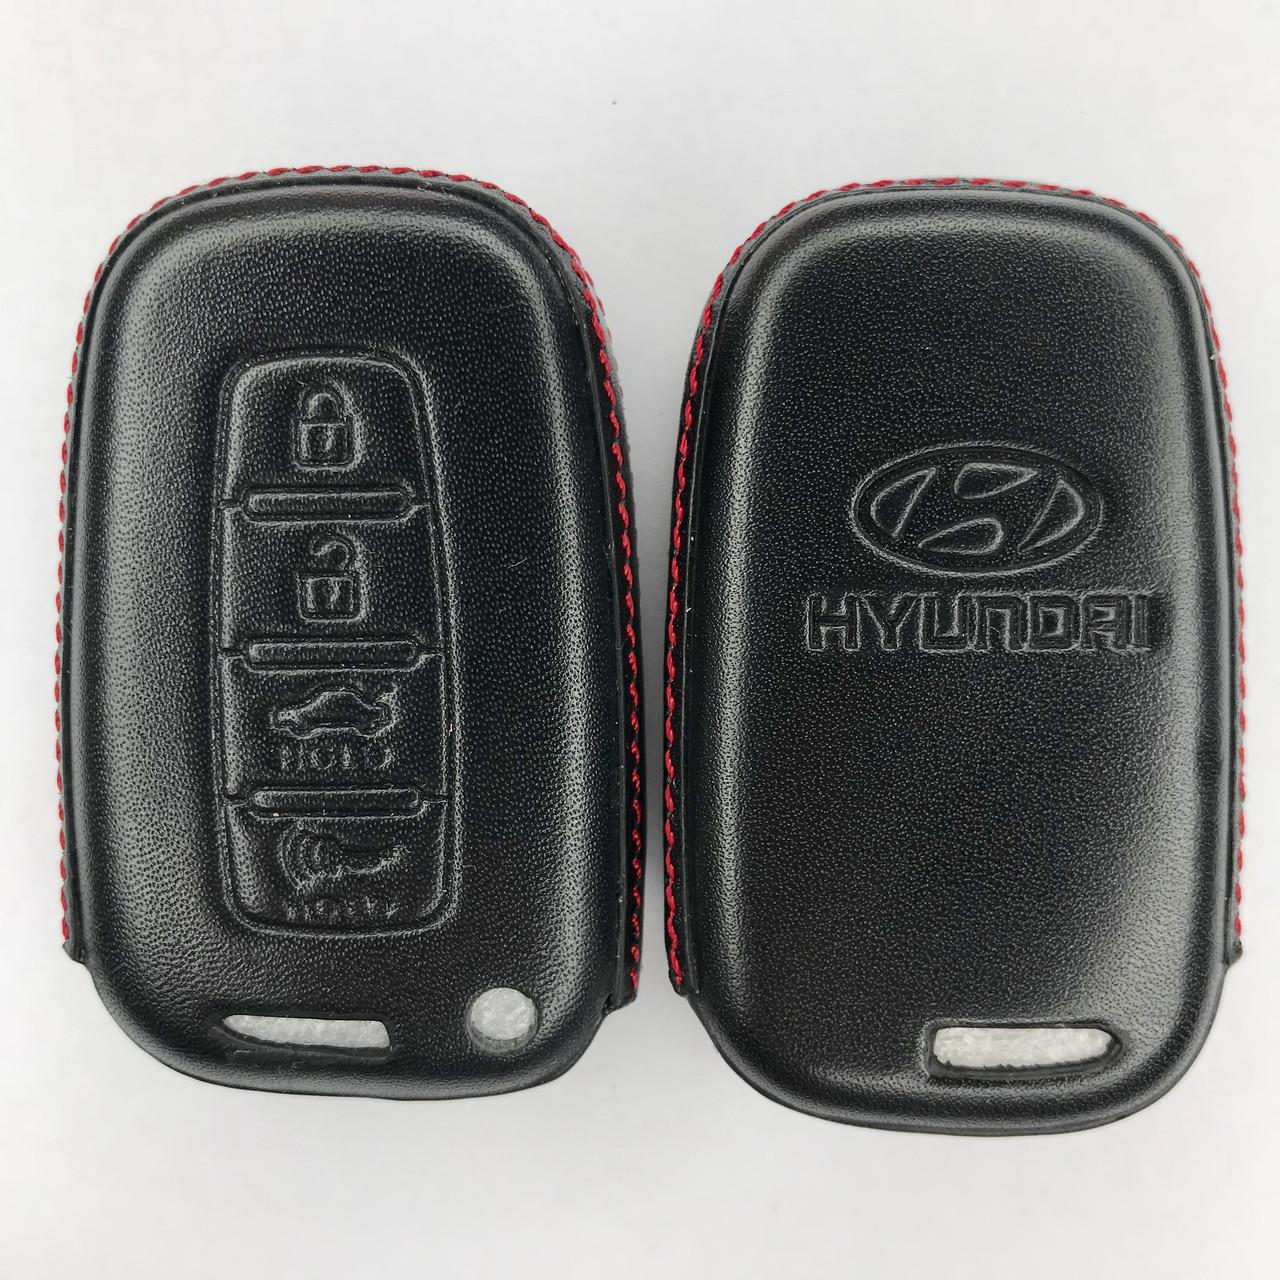 Кожаный чехол  для ключа Hyundai i10,i20,i40,Accent,Elantra,Sonata, Tucson,Santa Fe,VERNA,Genesis,Getz,IX35